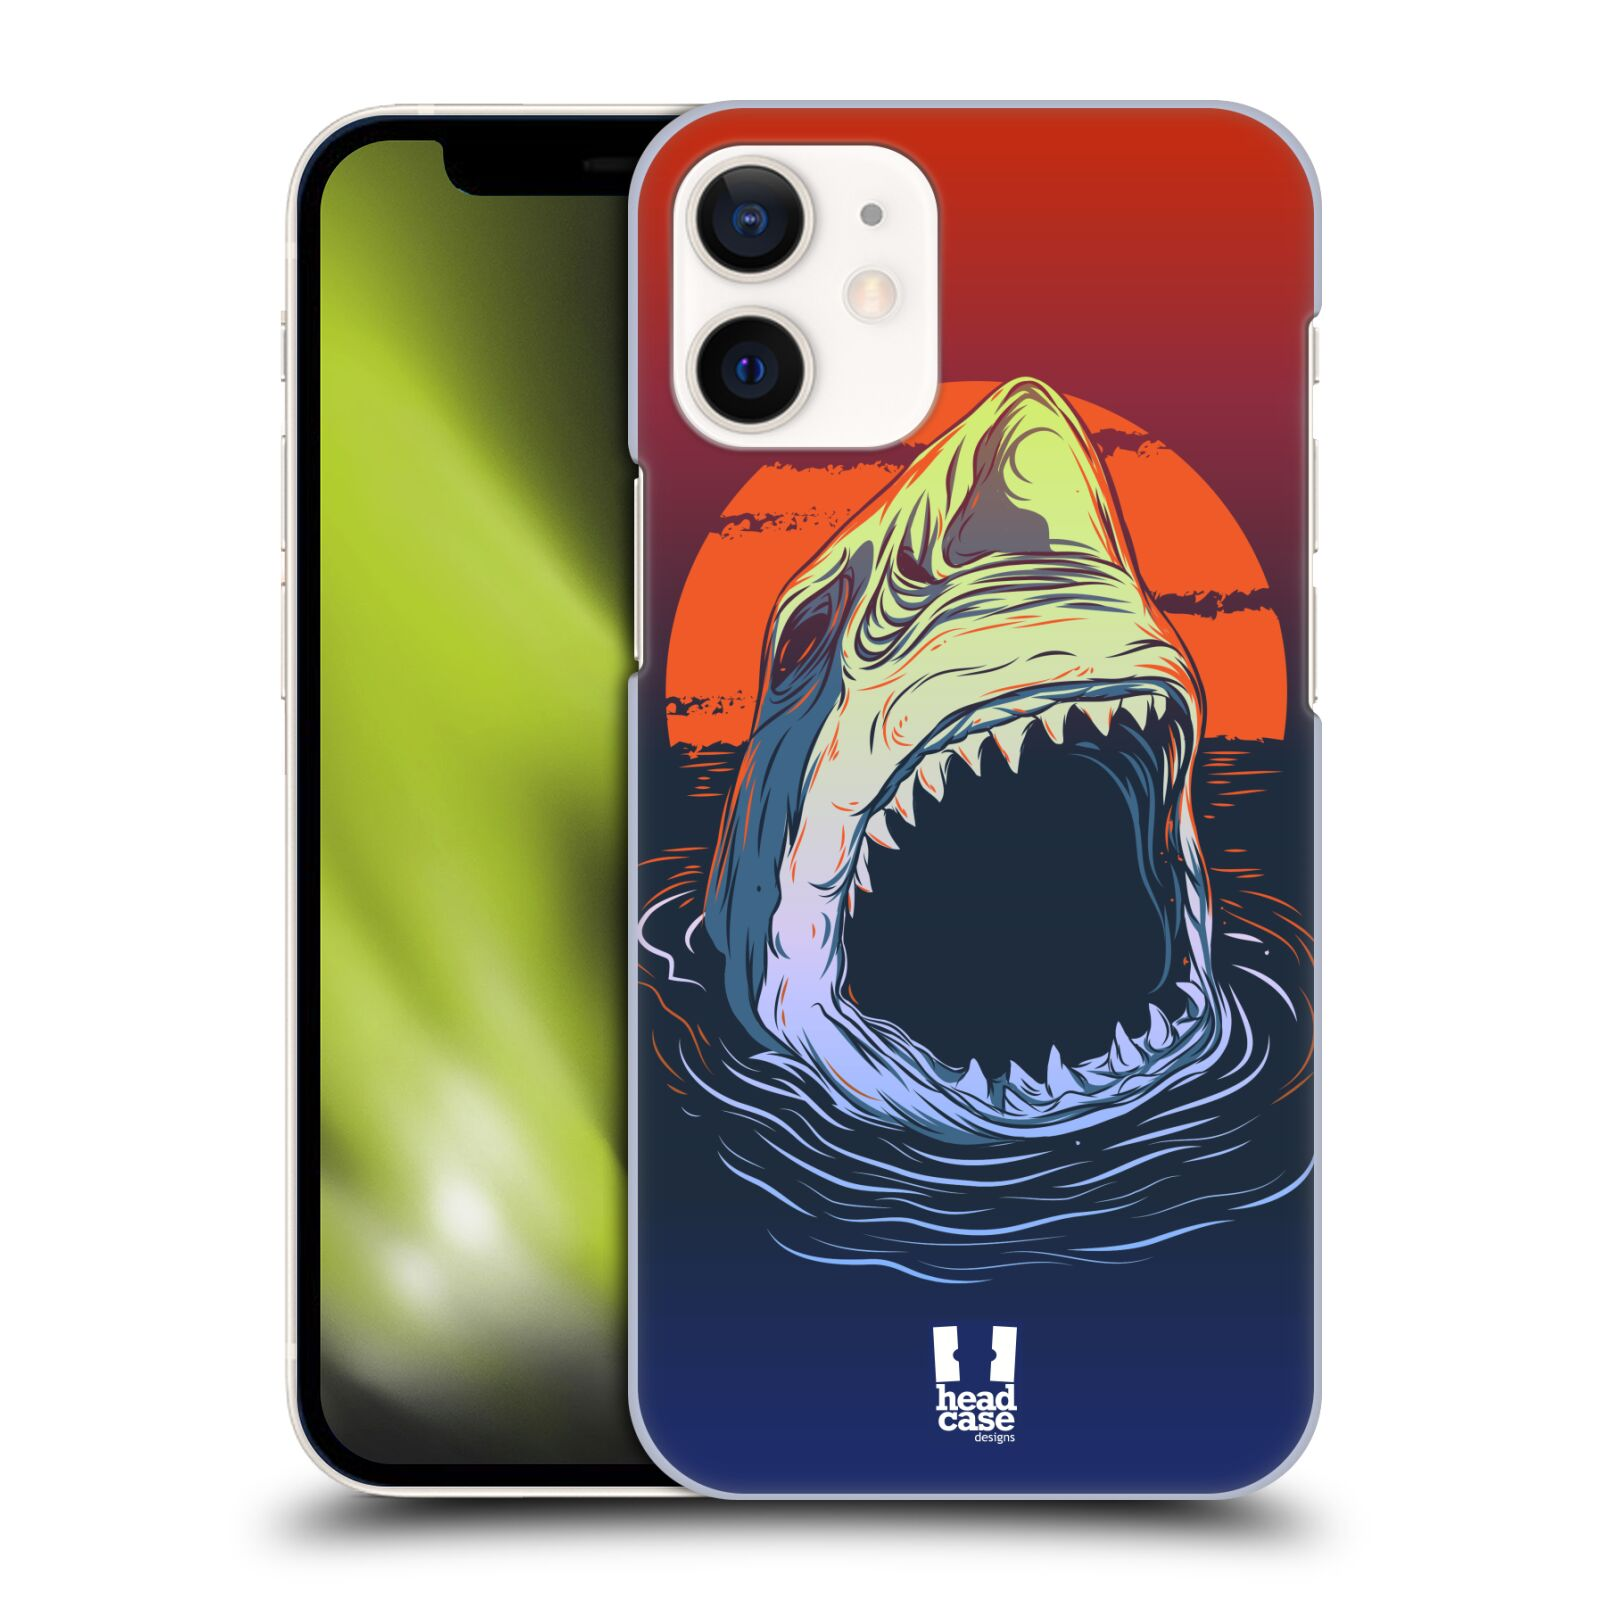 Plastový obal na mobil Apple Iphone 12 MINI vzor mořská monstra žralok